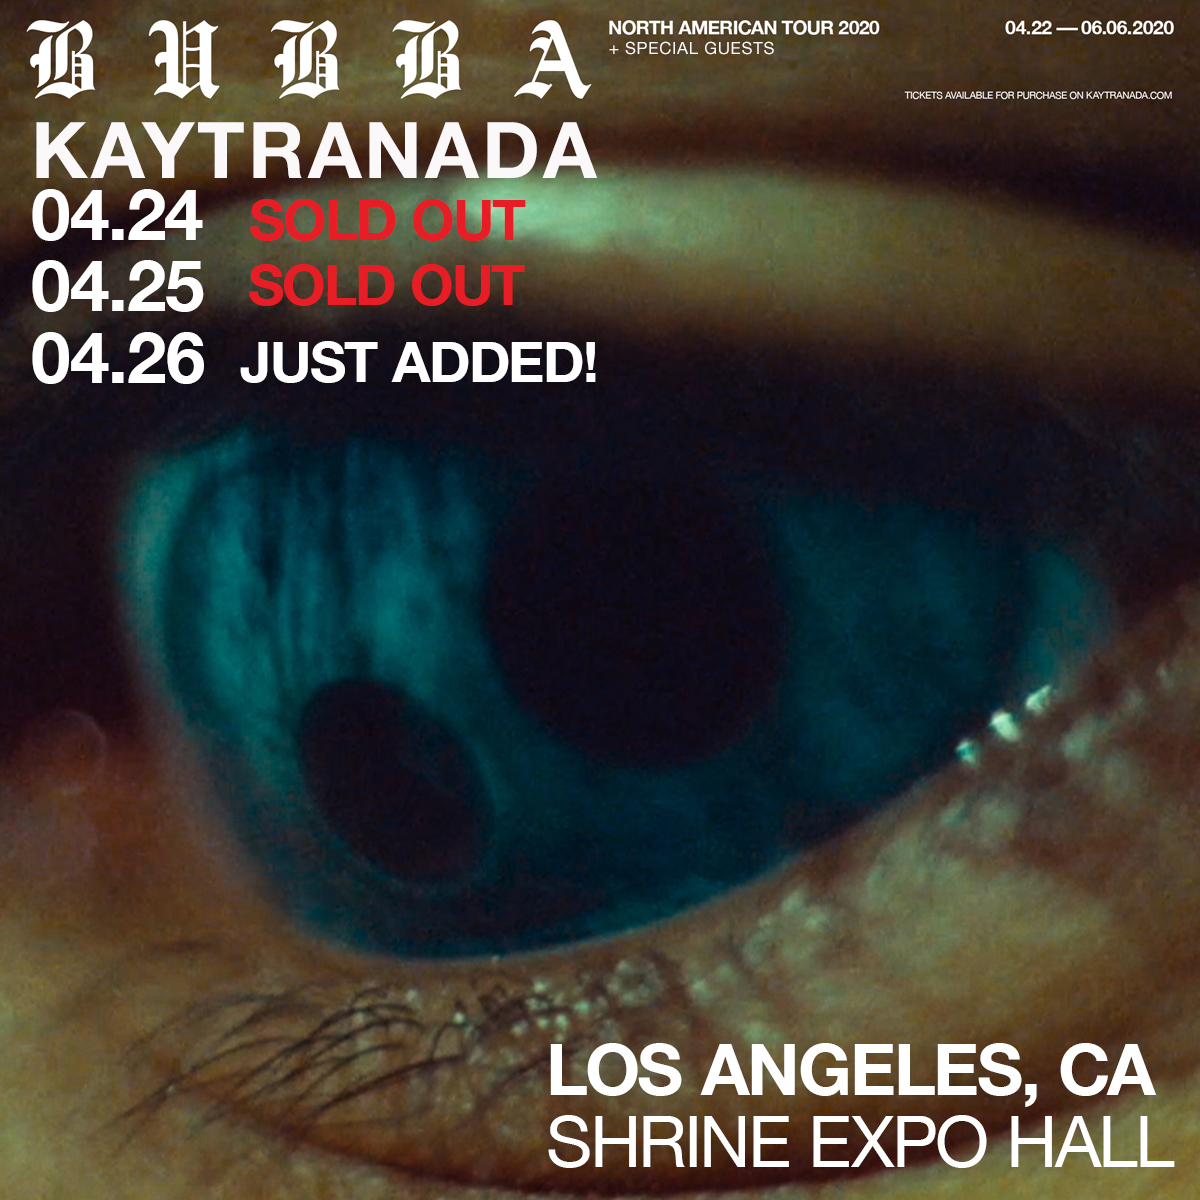 Anotha one *mic drop* 🎤@kaytranada Tix on sale Friday at 10am